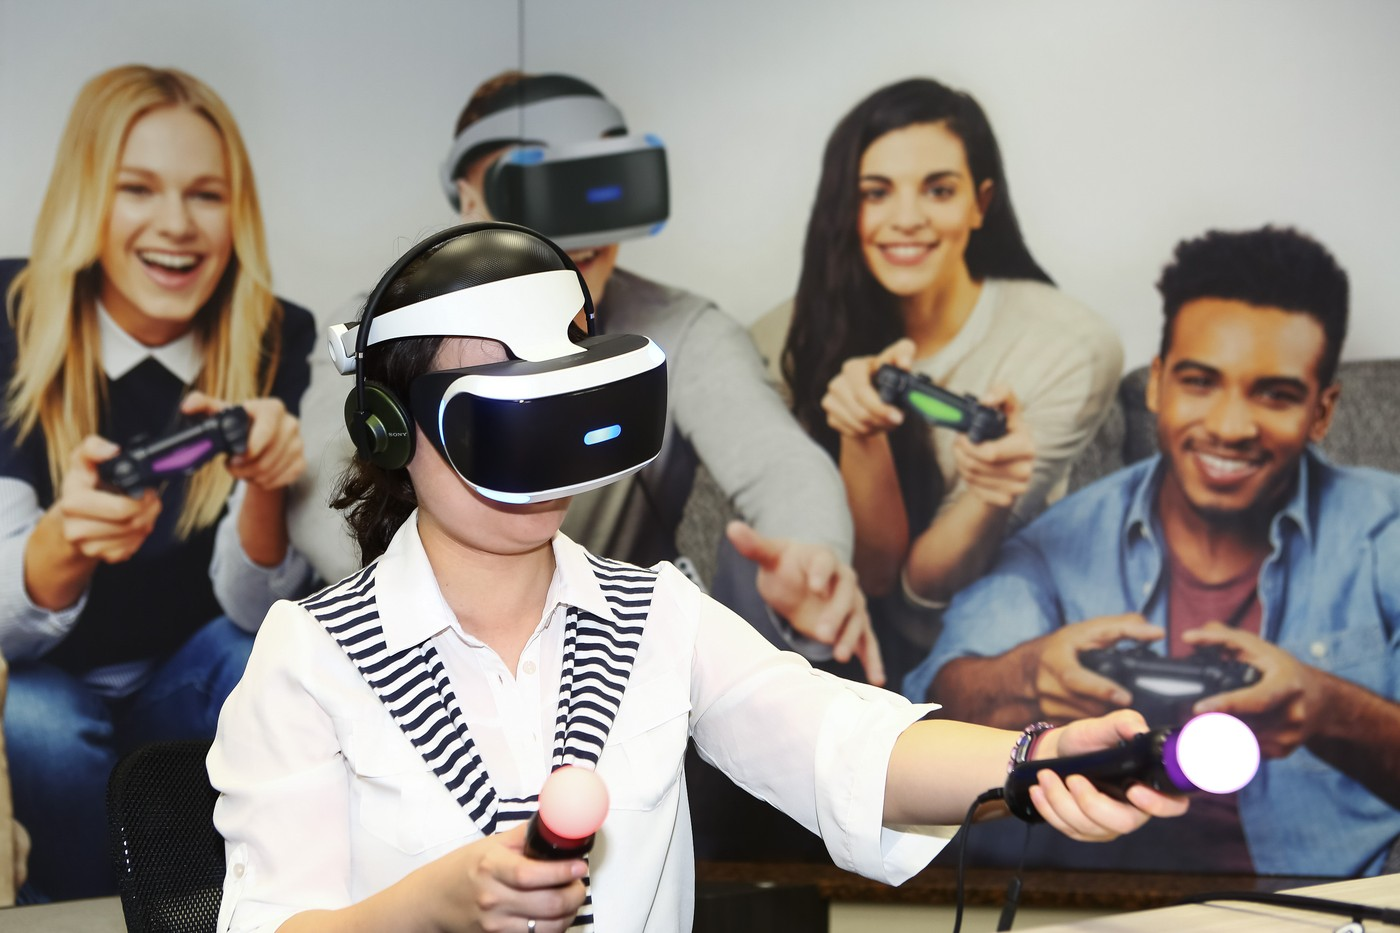 VR如何創造一個虛擬世界?談談現有的VR 體感回饋技術